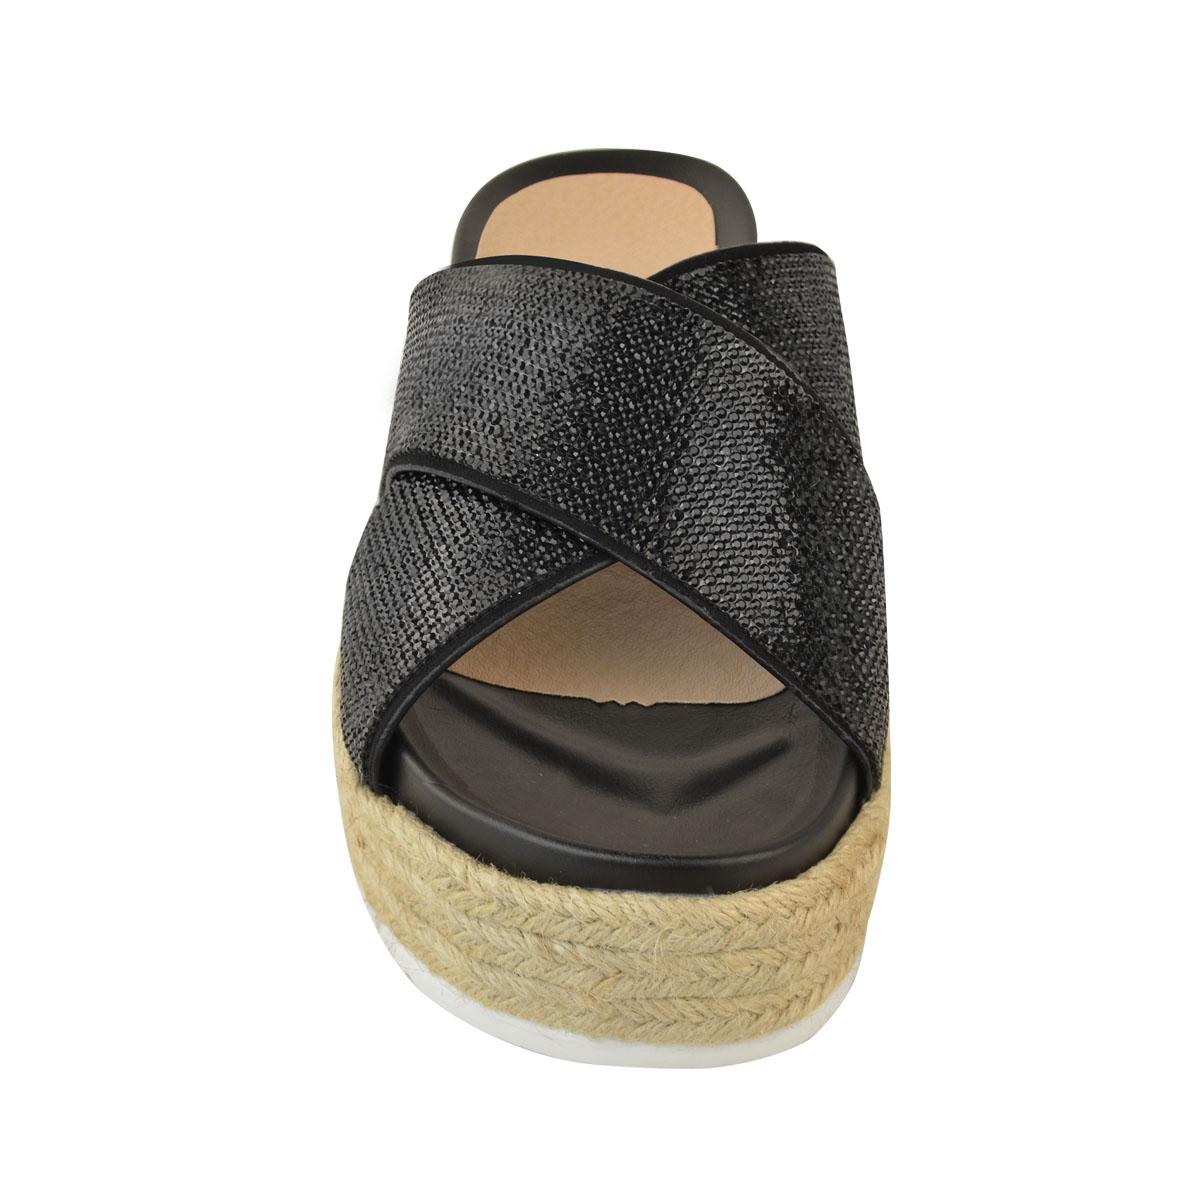 Womens-Ladies-Diamante-Slip-On-Sandals-Flatforms-Sparkly-Platform-Summer-Size-UK thumbnail 6